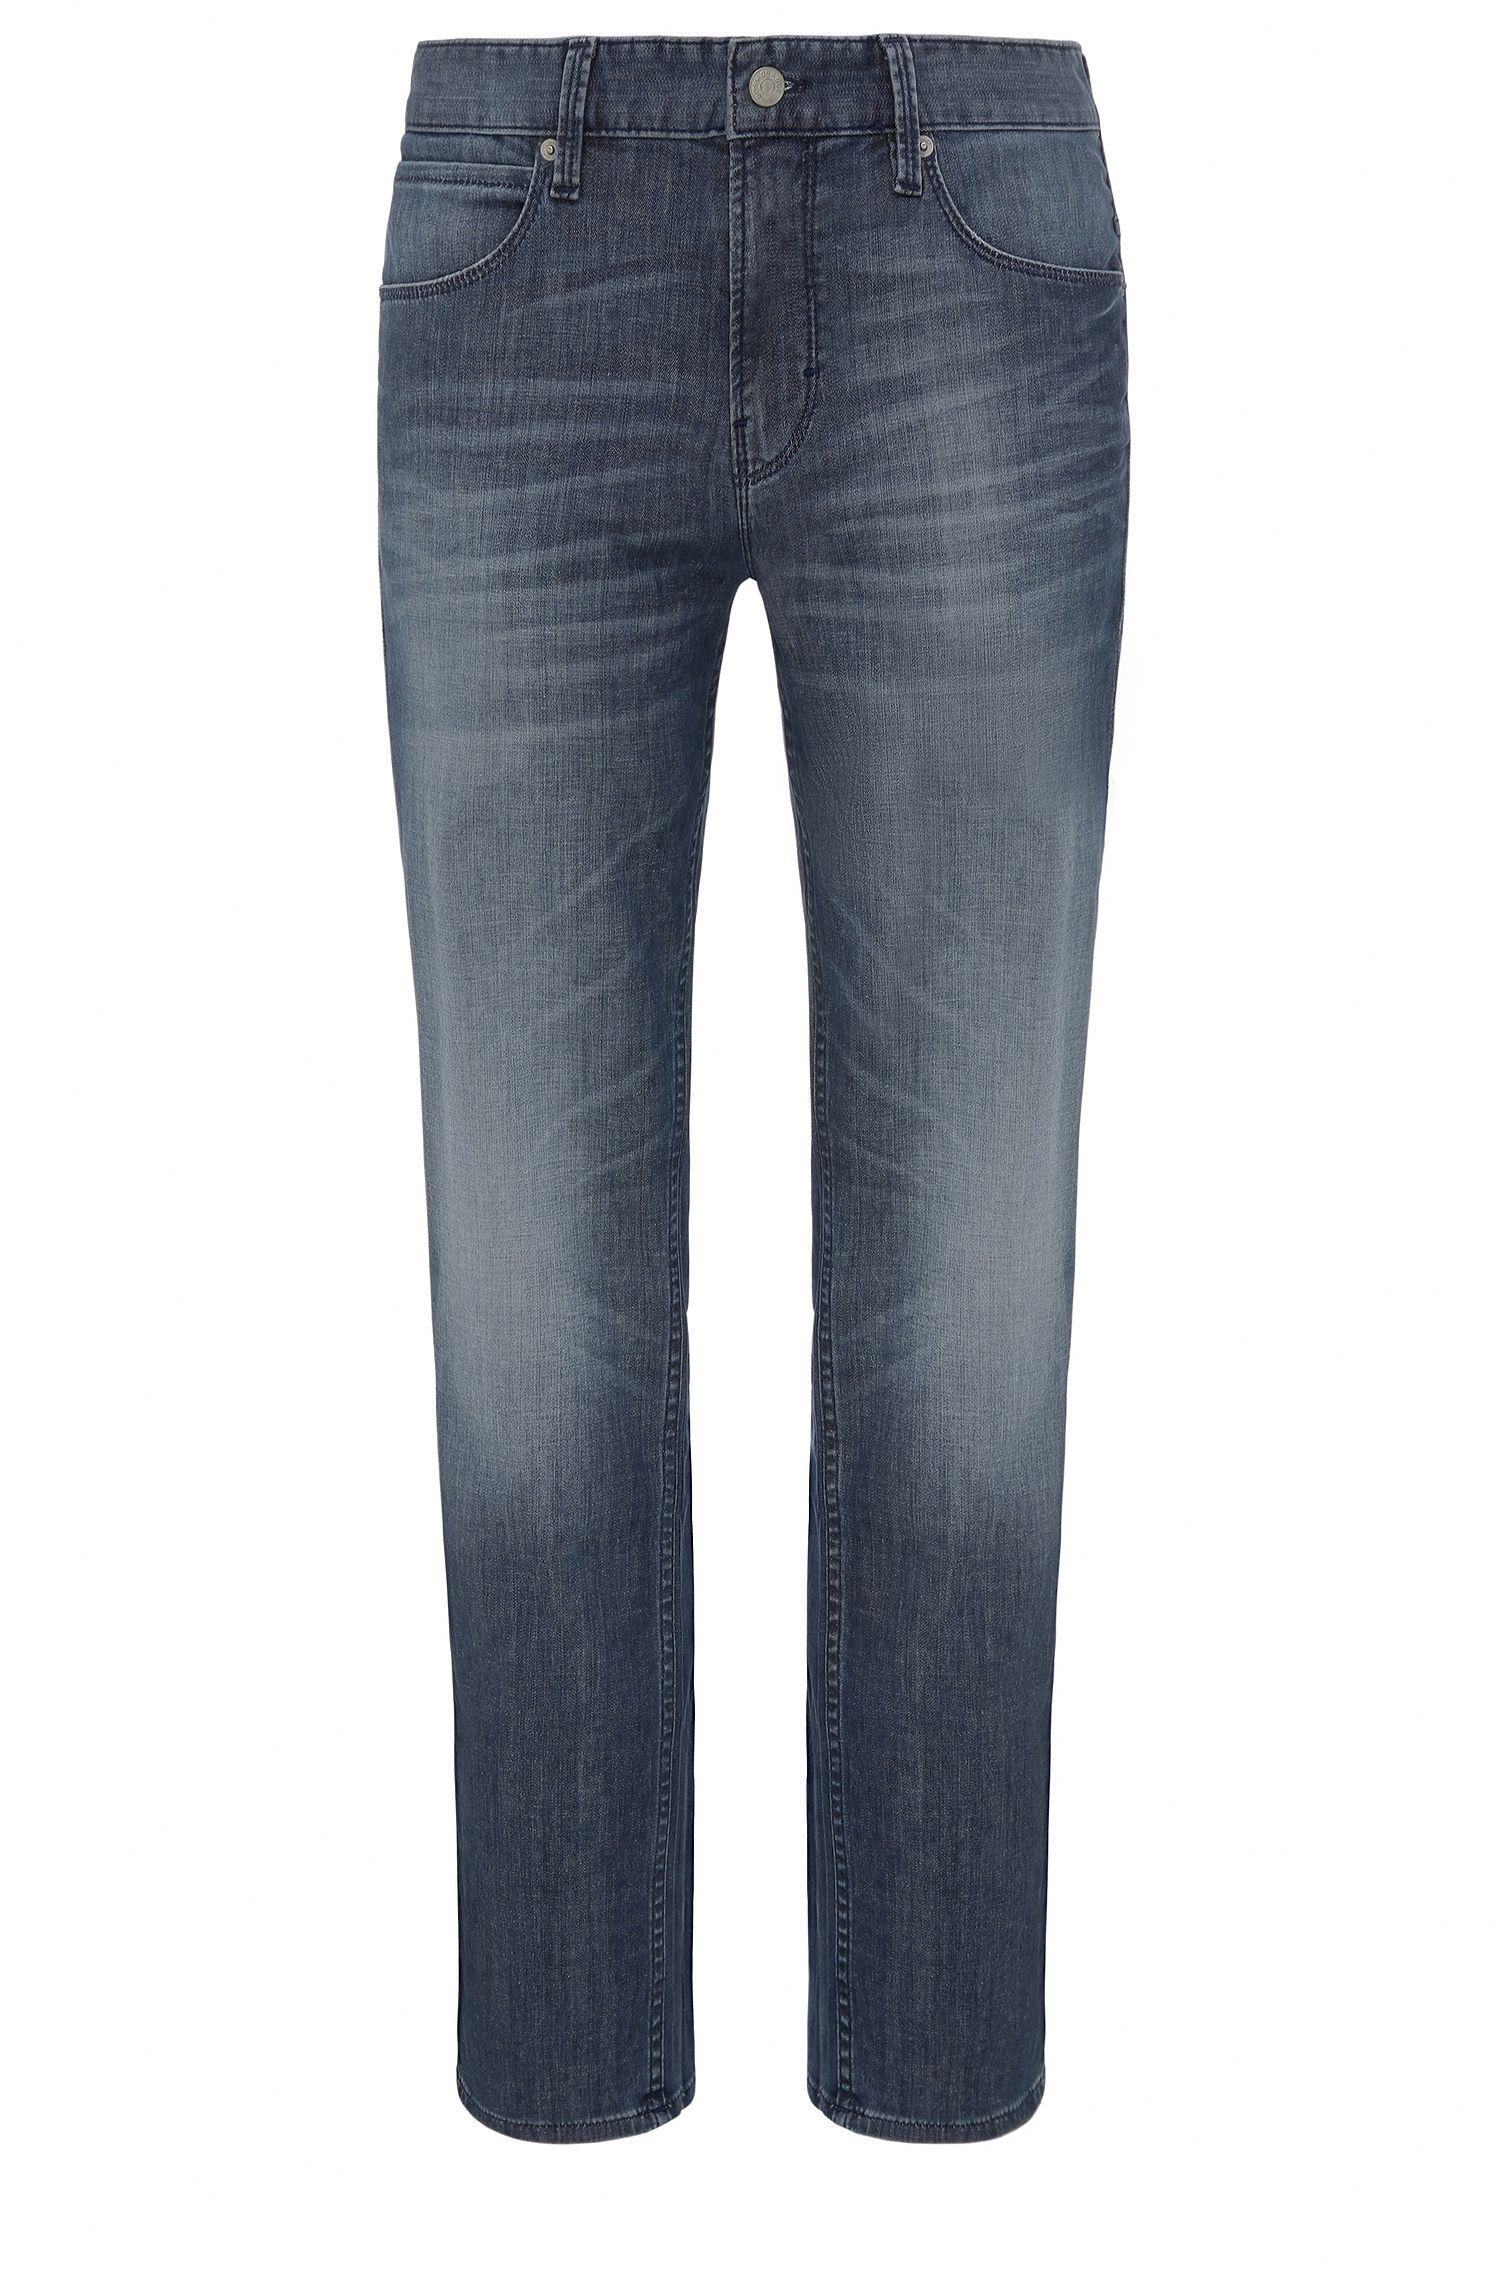 8.25 oz Stretch Cotton Blend Jeans, Slim Fit | Orange63